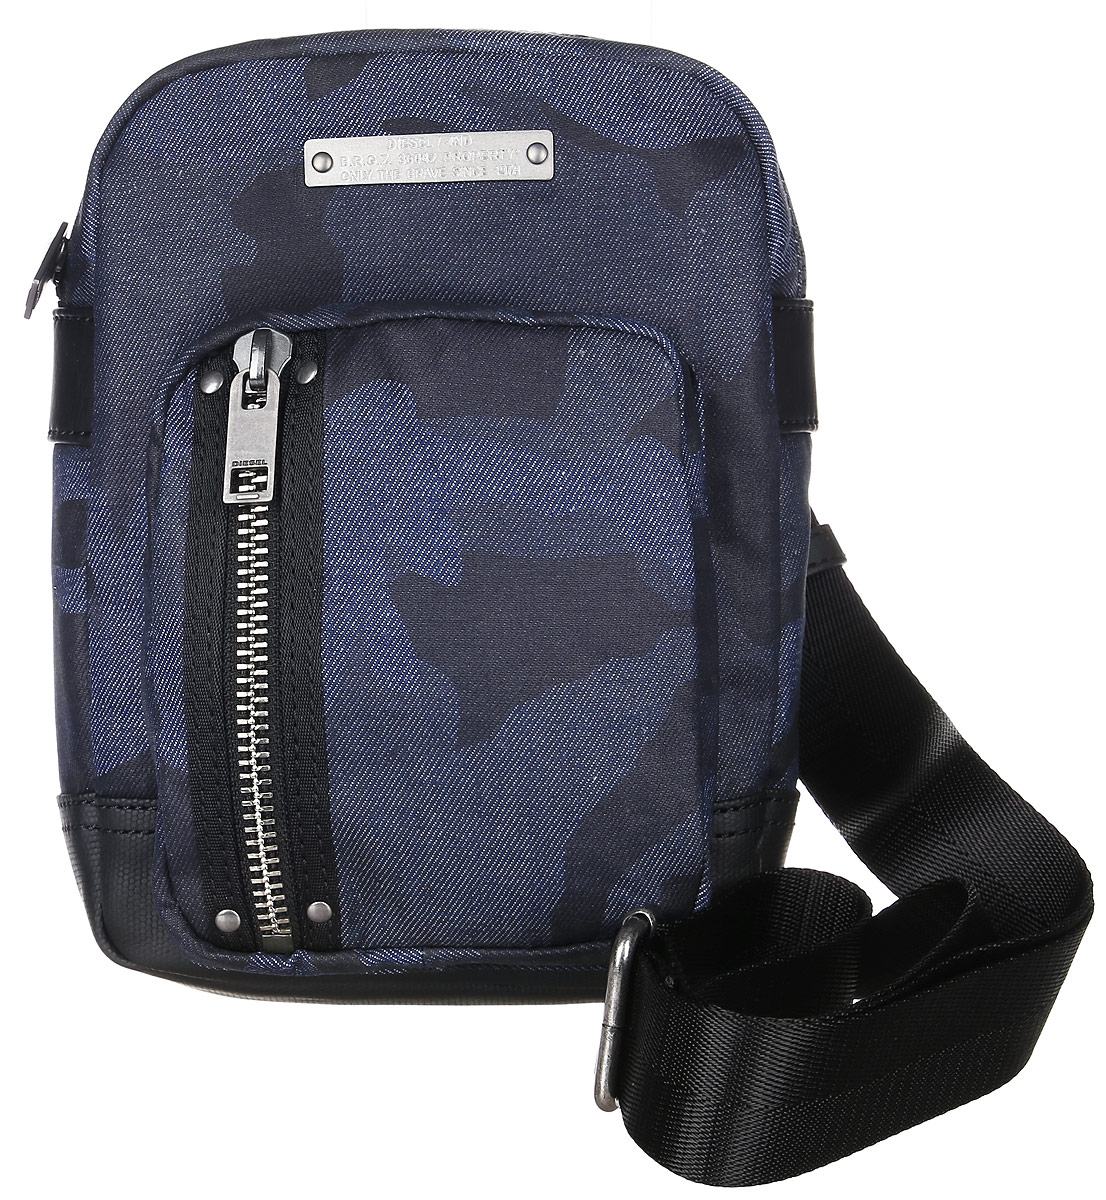 цена Сумка мужская Diesel, цвет: темно-синий, черный. X03778-P1106 онлайн в 2017 году